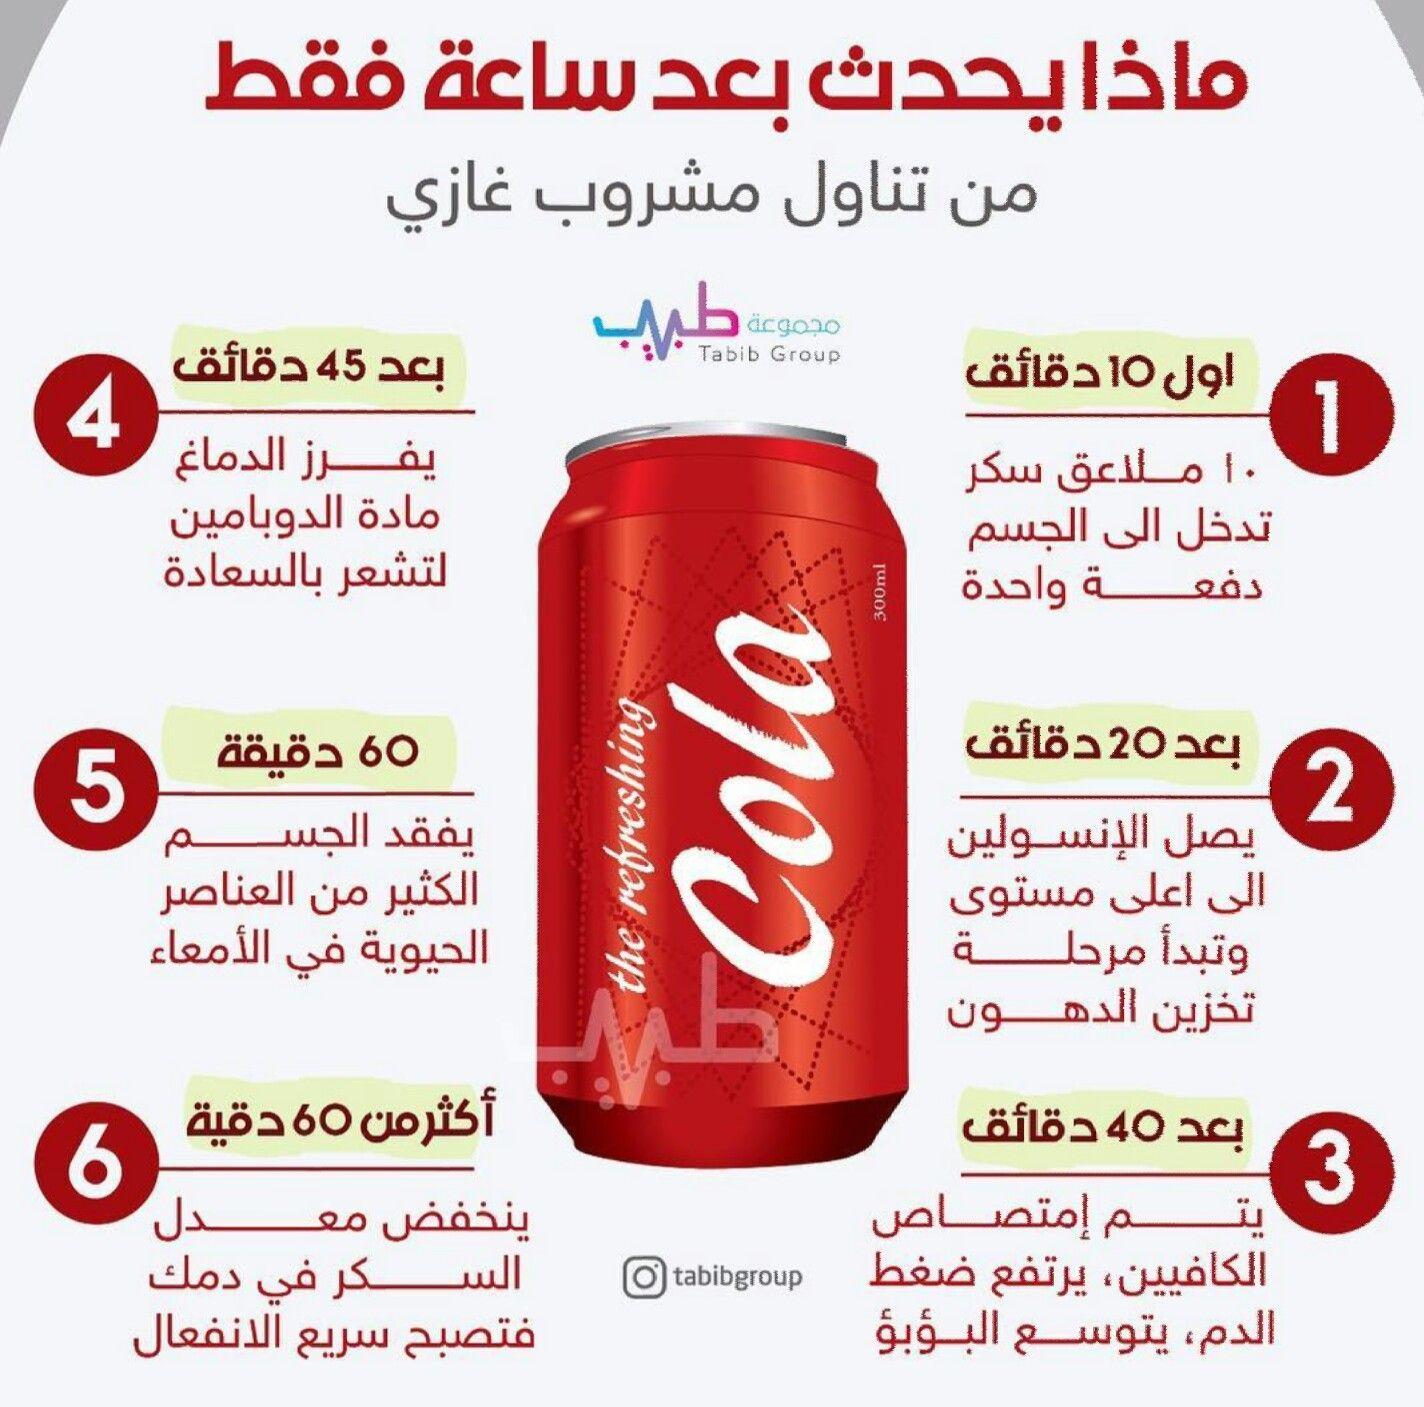 Pin By Doha Dardeer On Aya Naji Health And Wellness Center Health Fitness Nutrition Health Facts Food